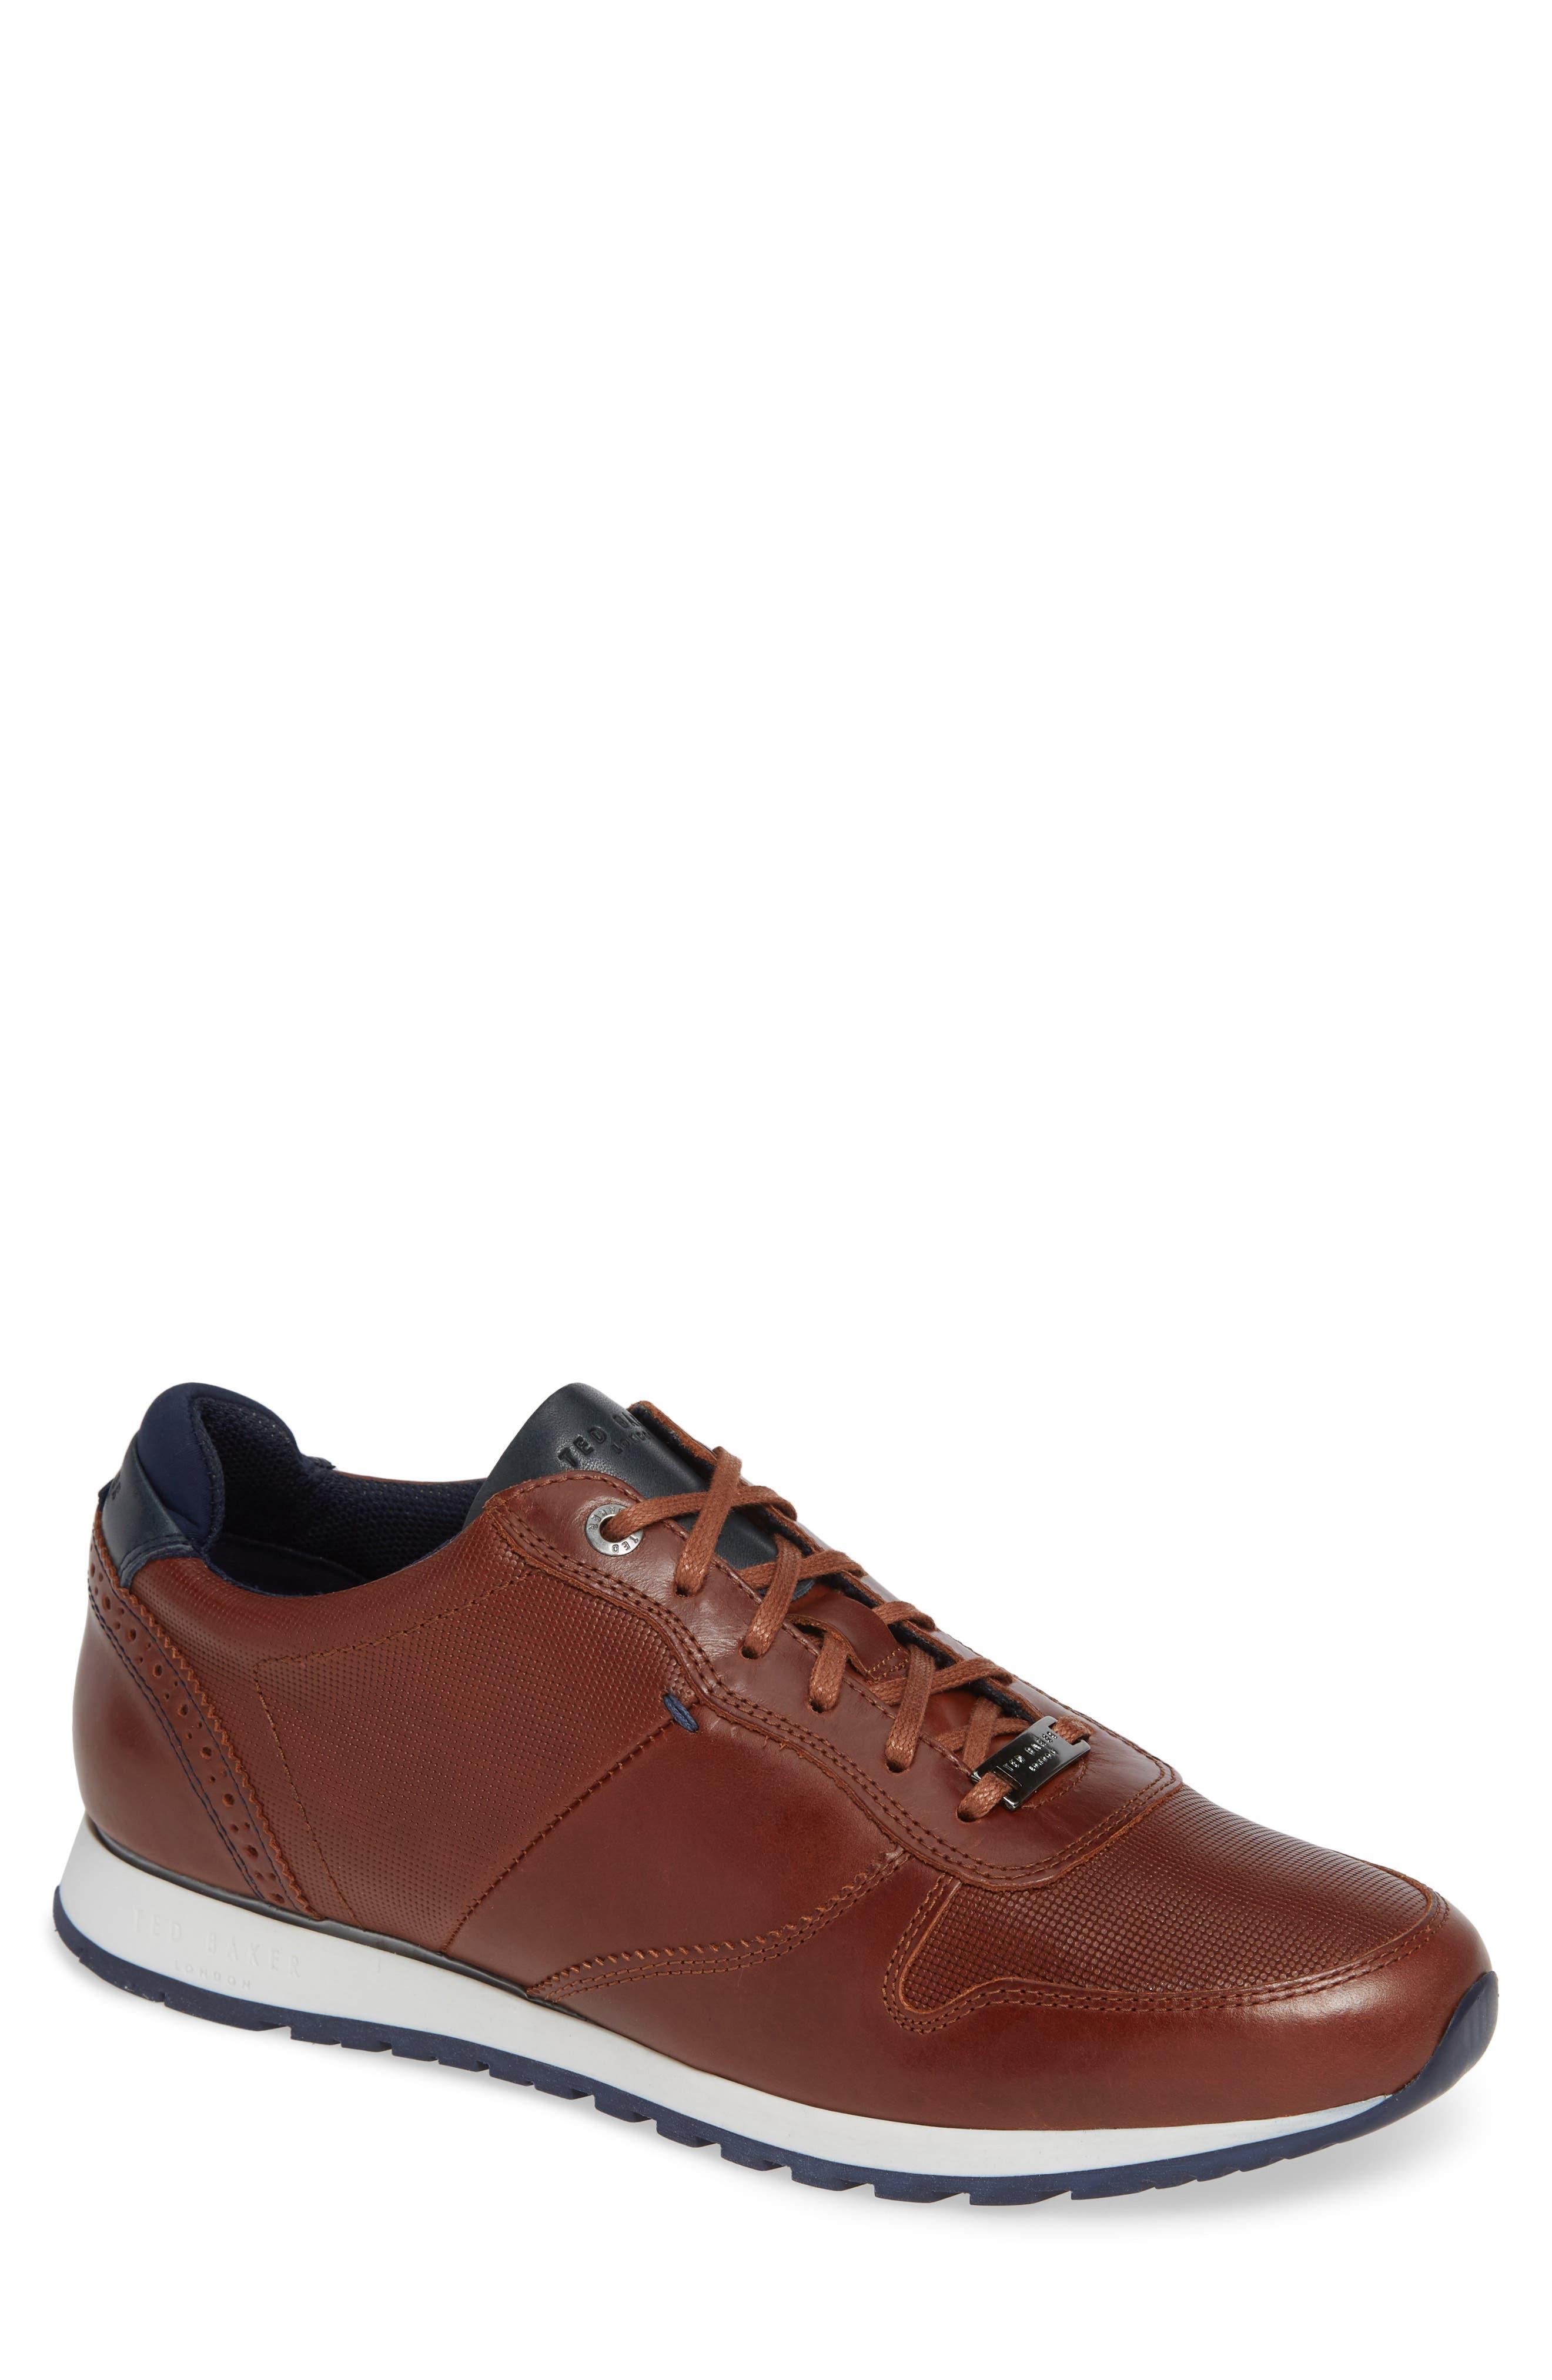 Shindl Sneaker,                         Main,                         color, DARK TAN LEATHER